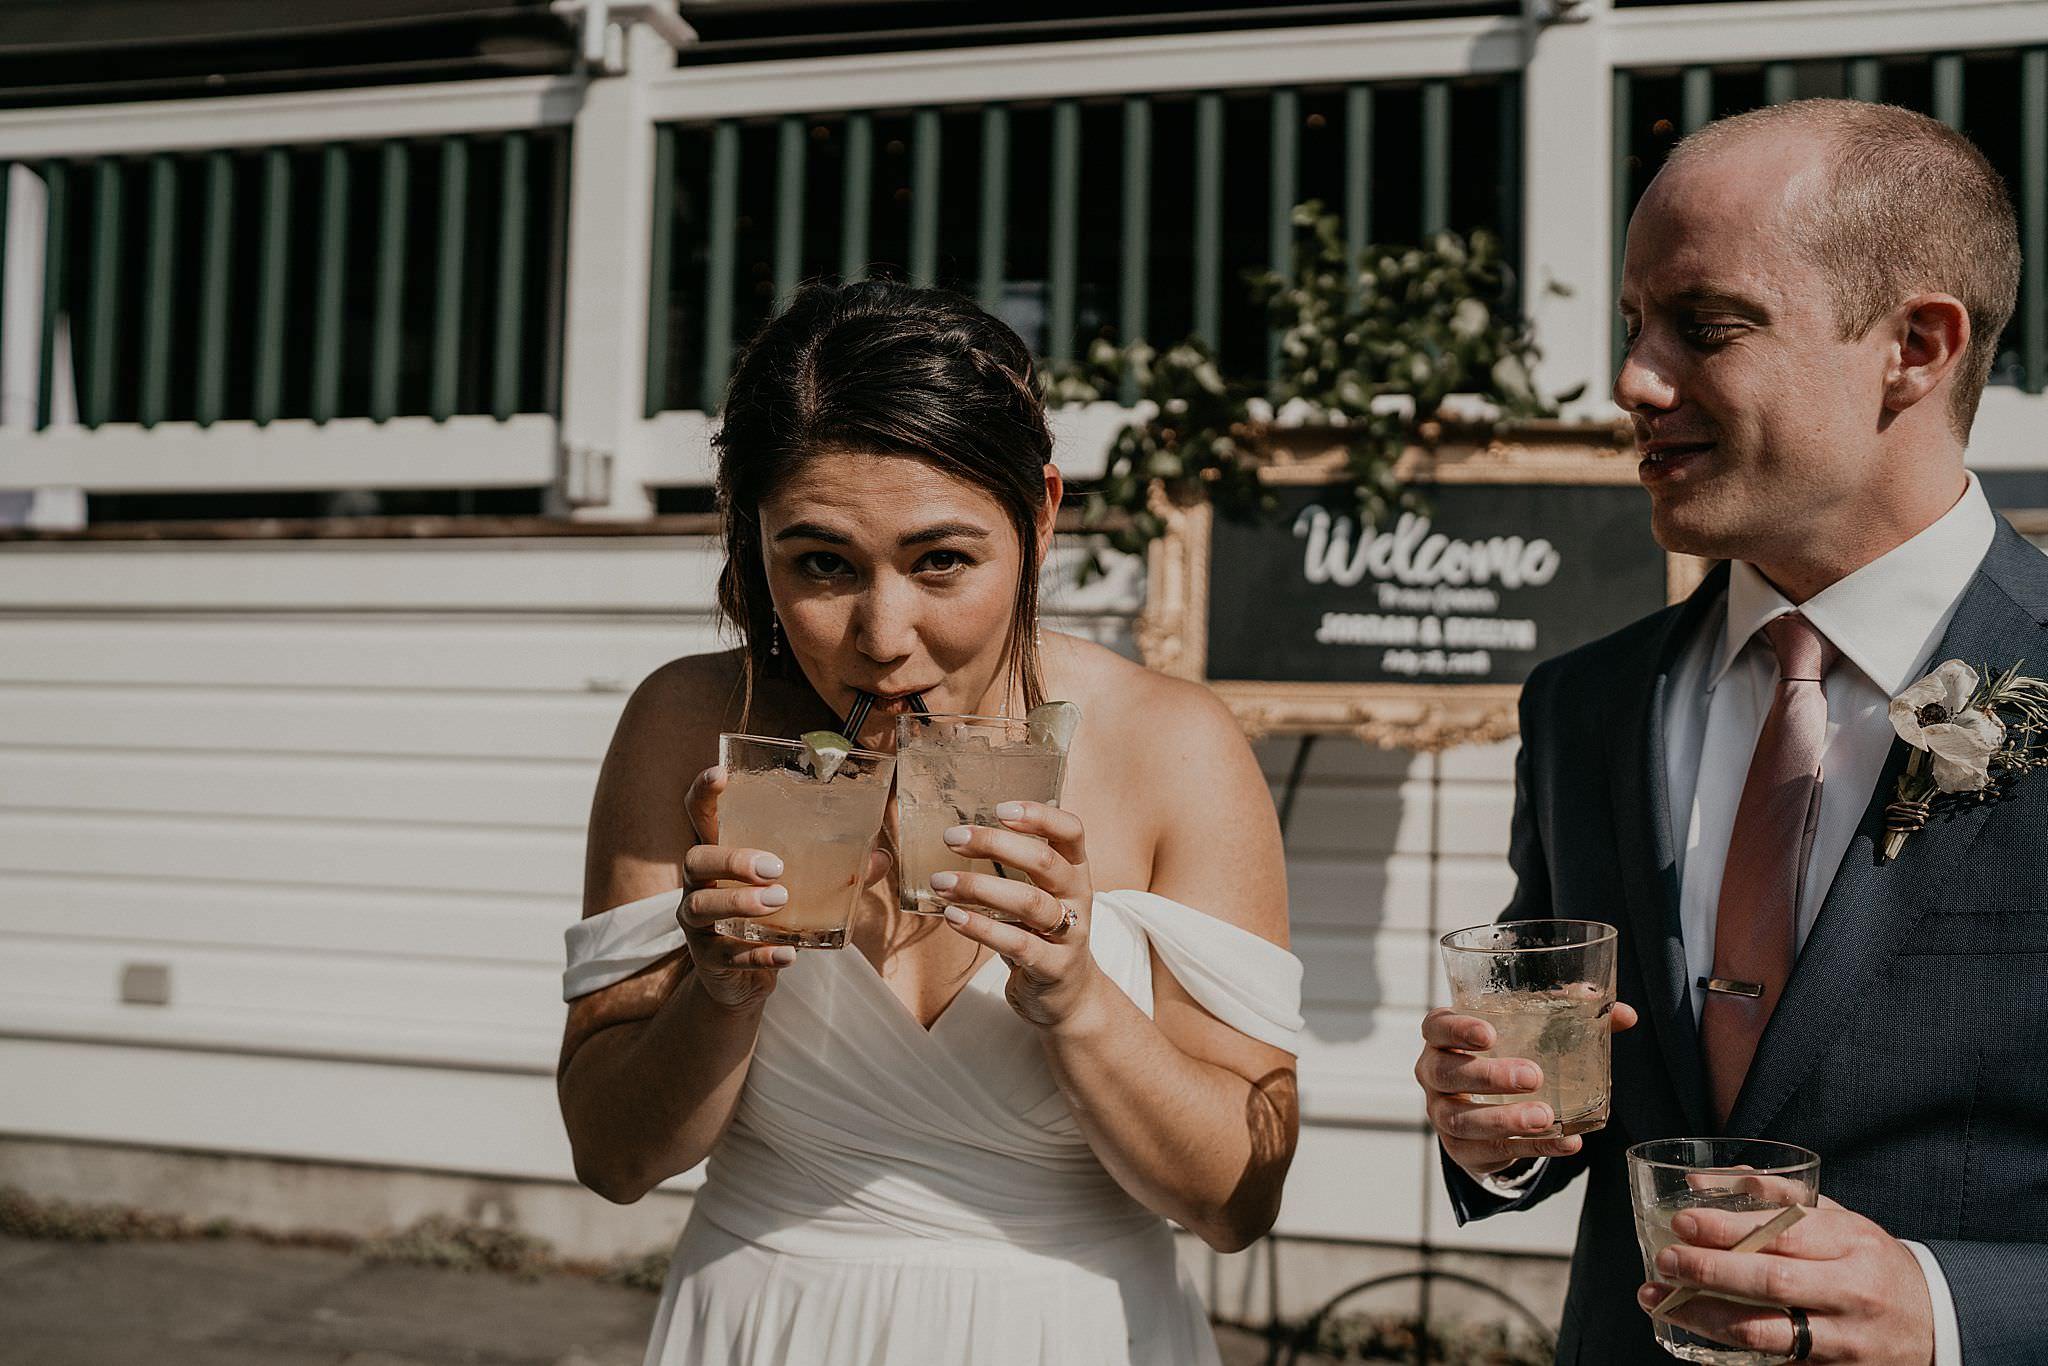 roche-harbor-wedding-san-juans-island-washington_0112.jpg